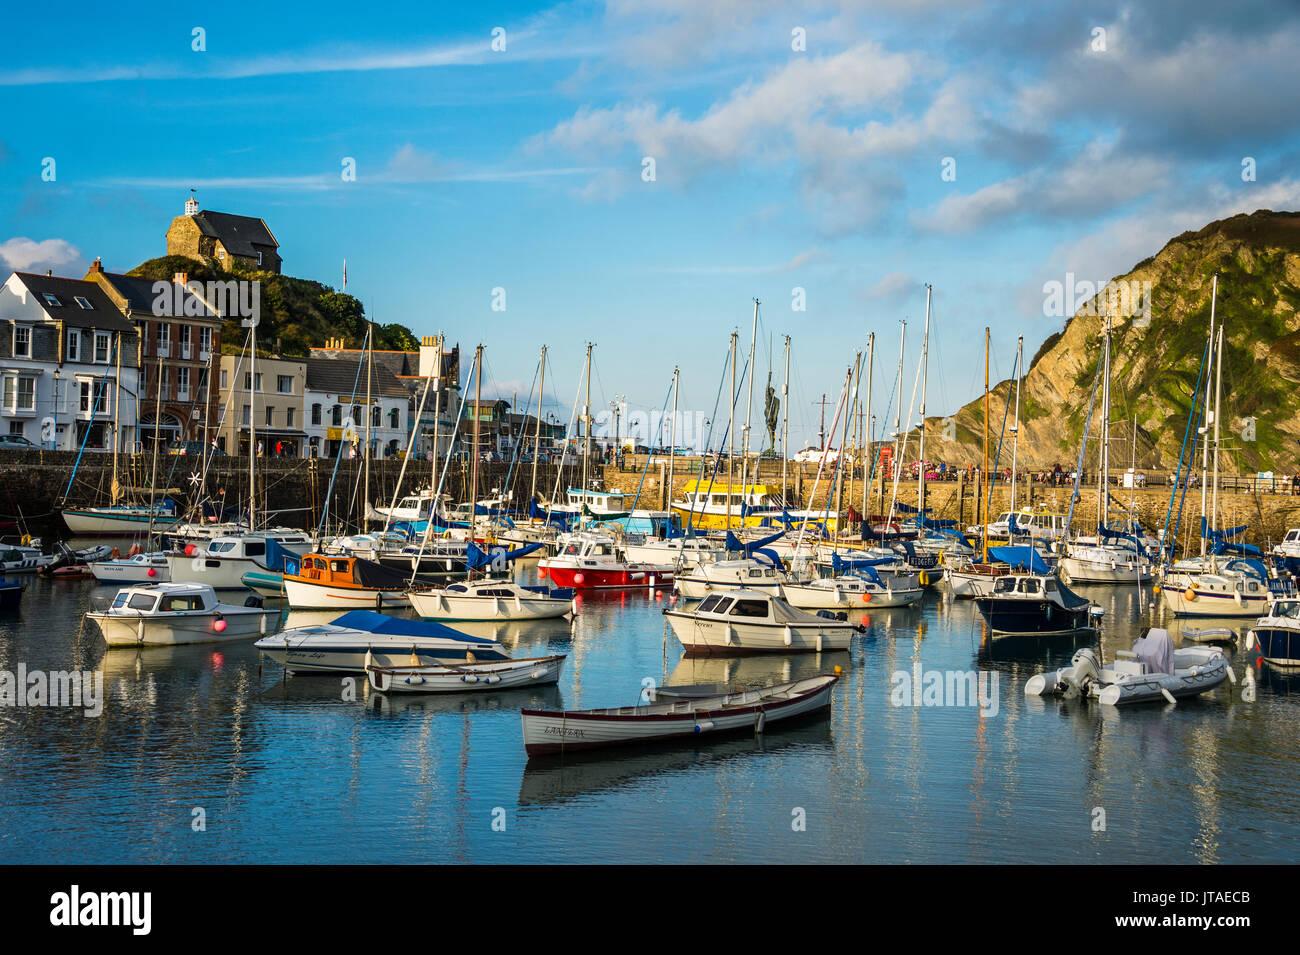 Puerto Boat de Ifracombe, North Devon, Inglaterra, Reino Unido, Europa Imagen De Stock